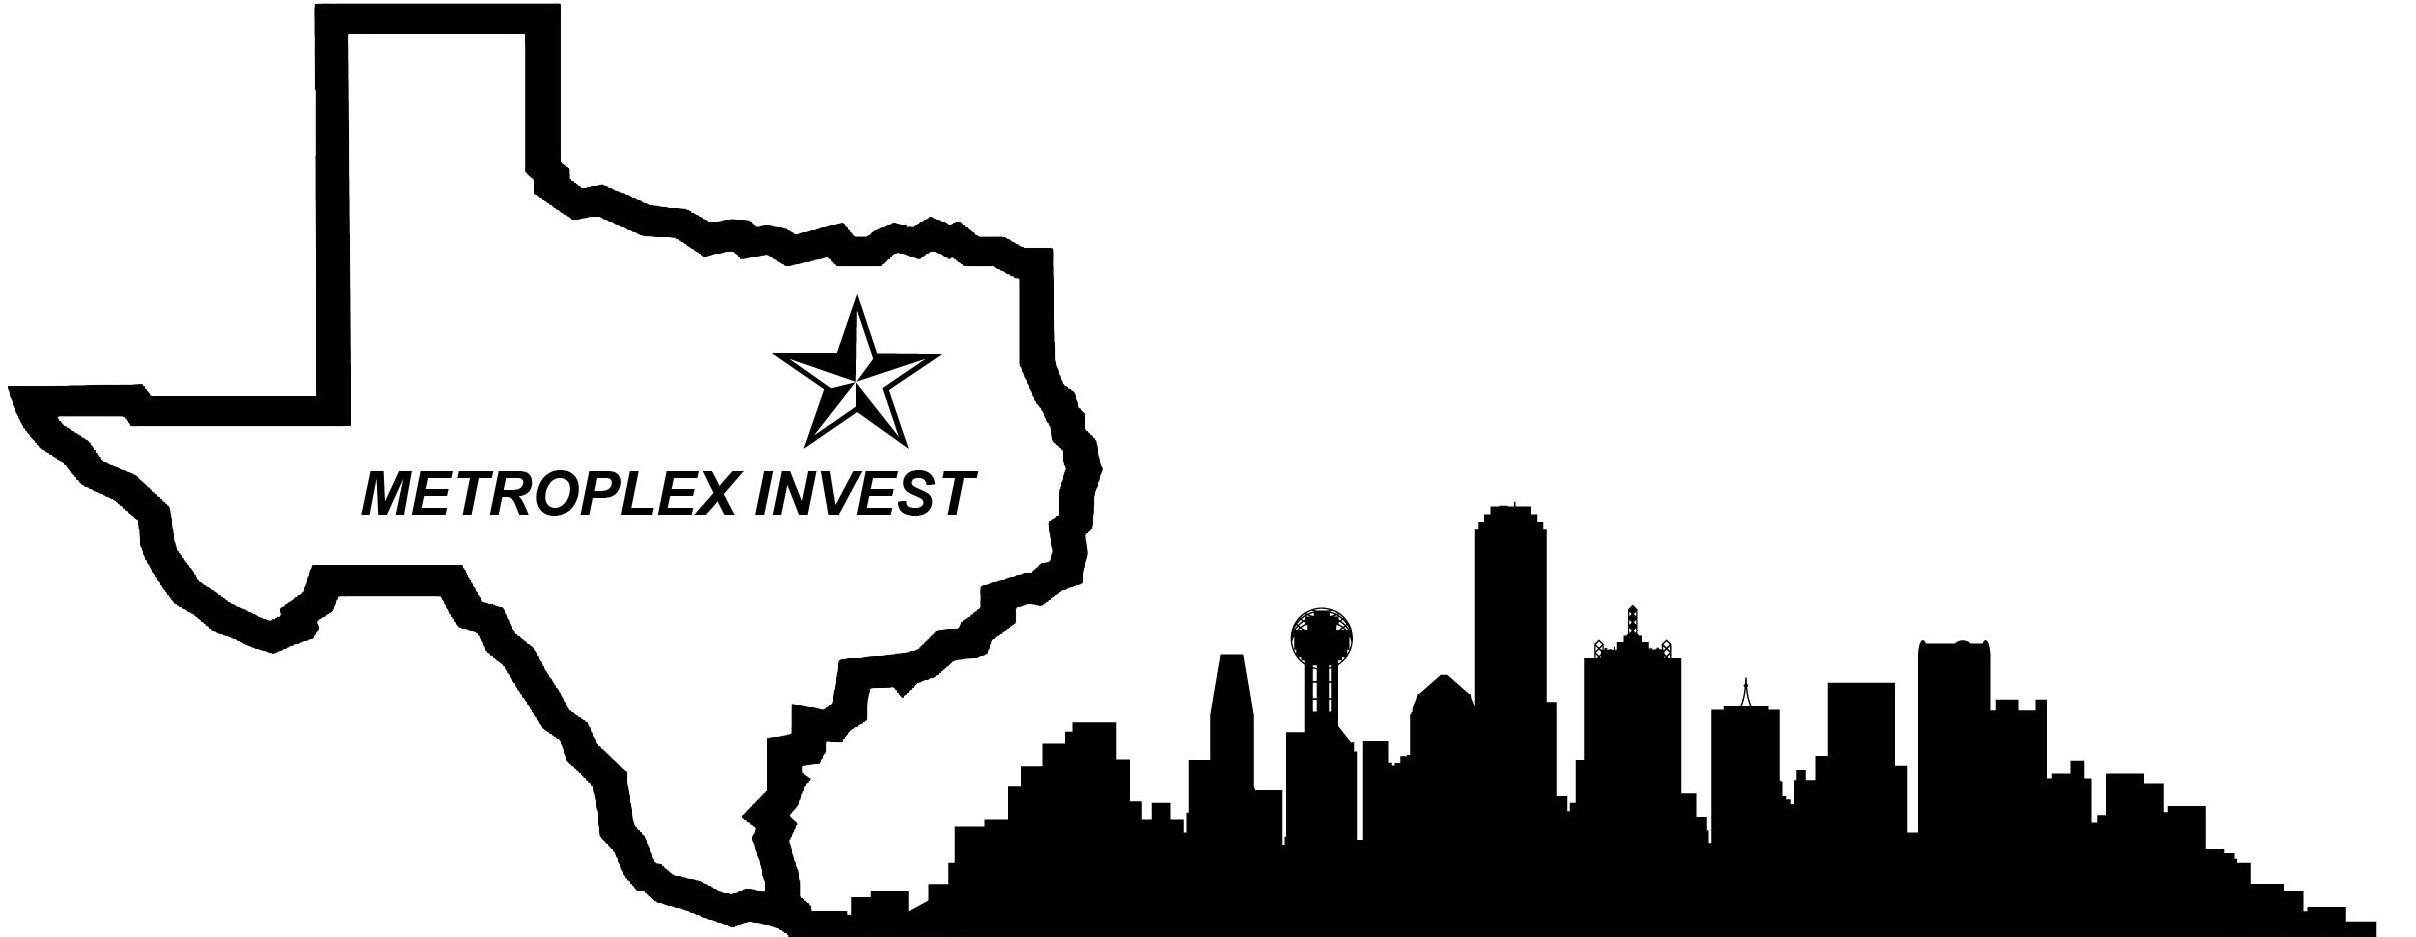 Metroplex Invest logo